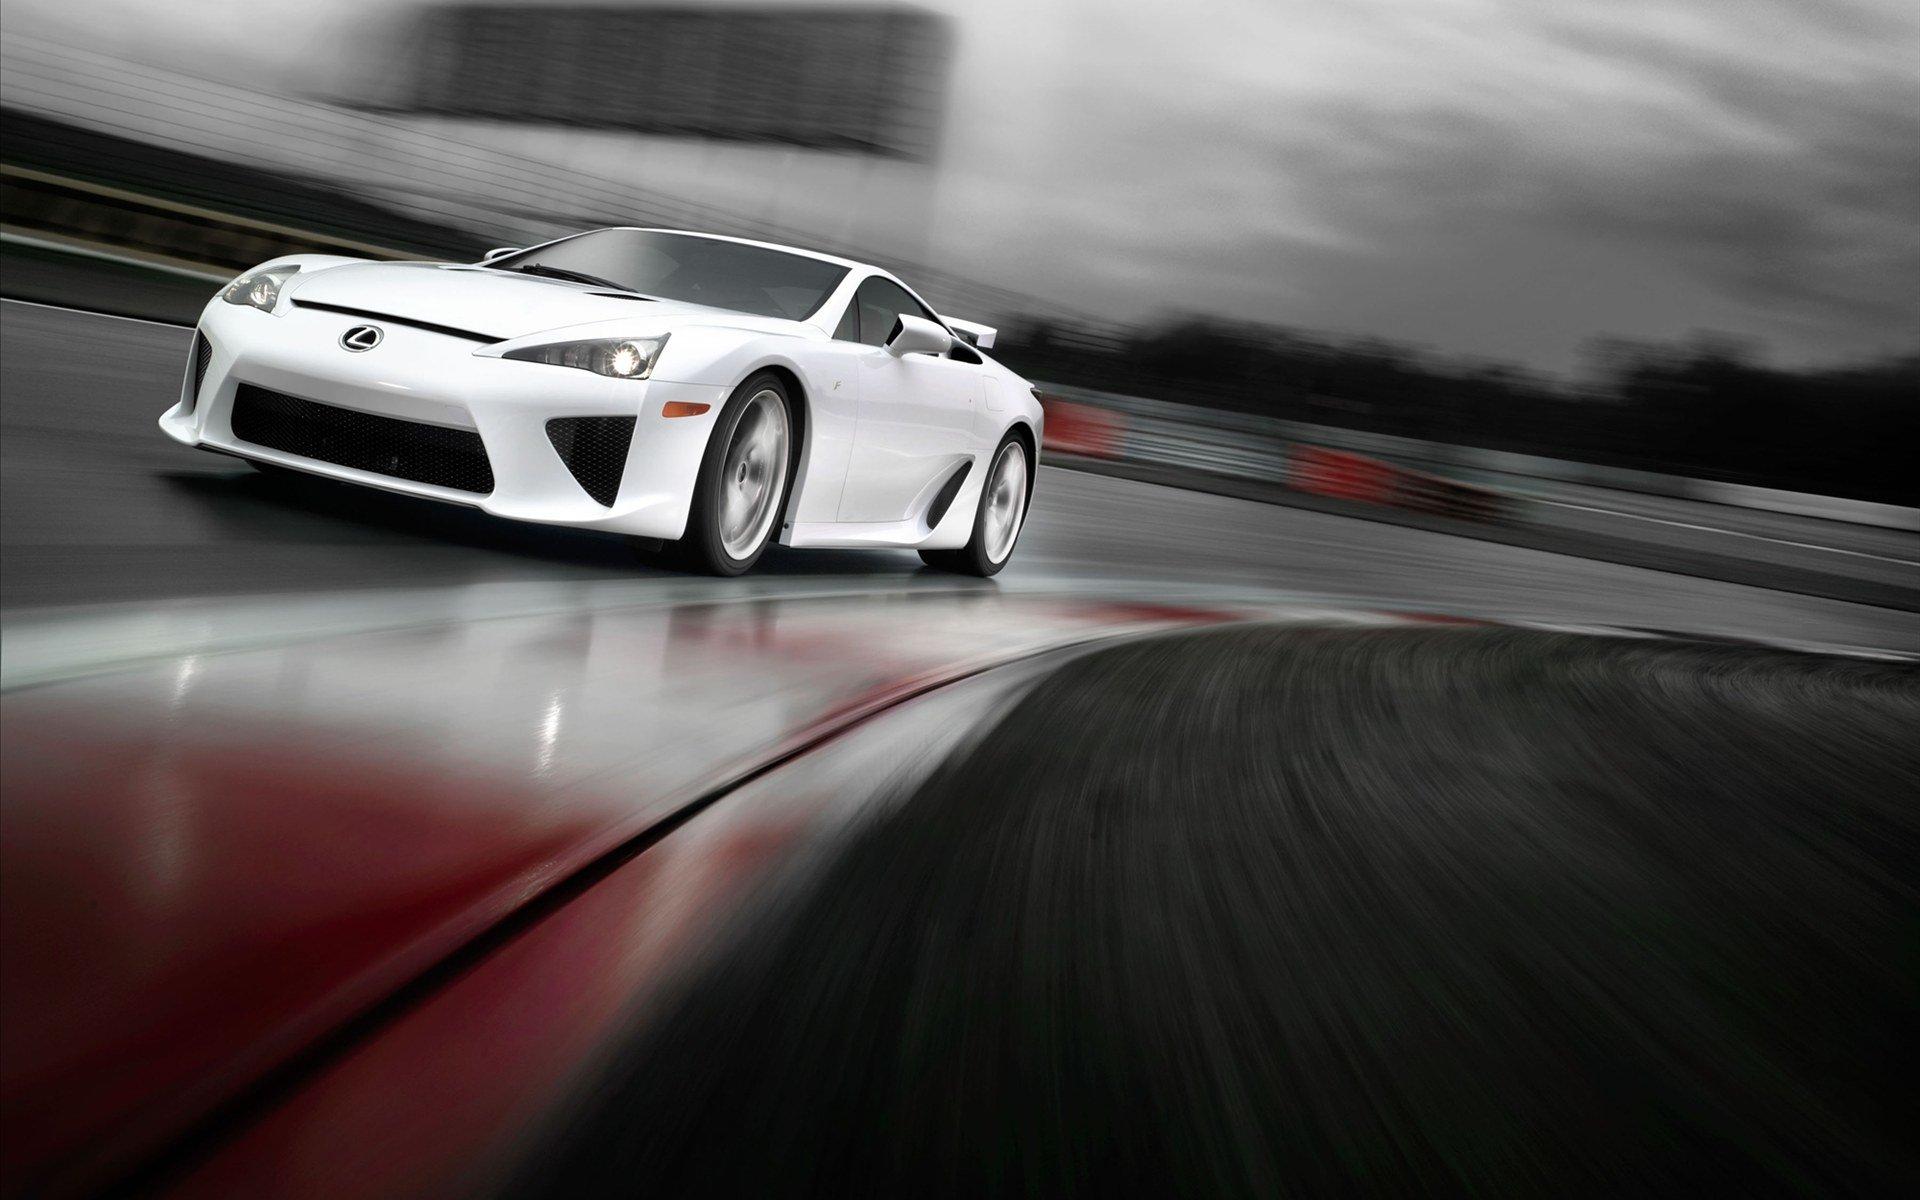 Lexus Lfa Wallpapers Hd For Desktop Backgrounds